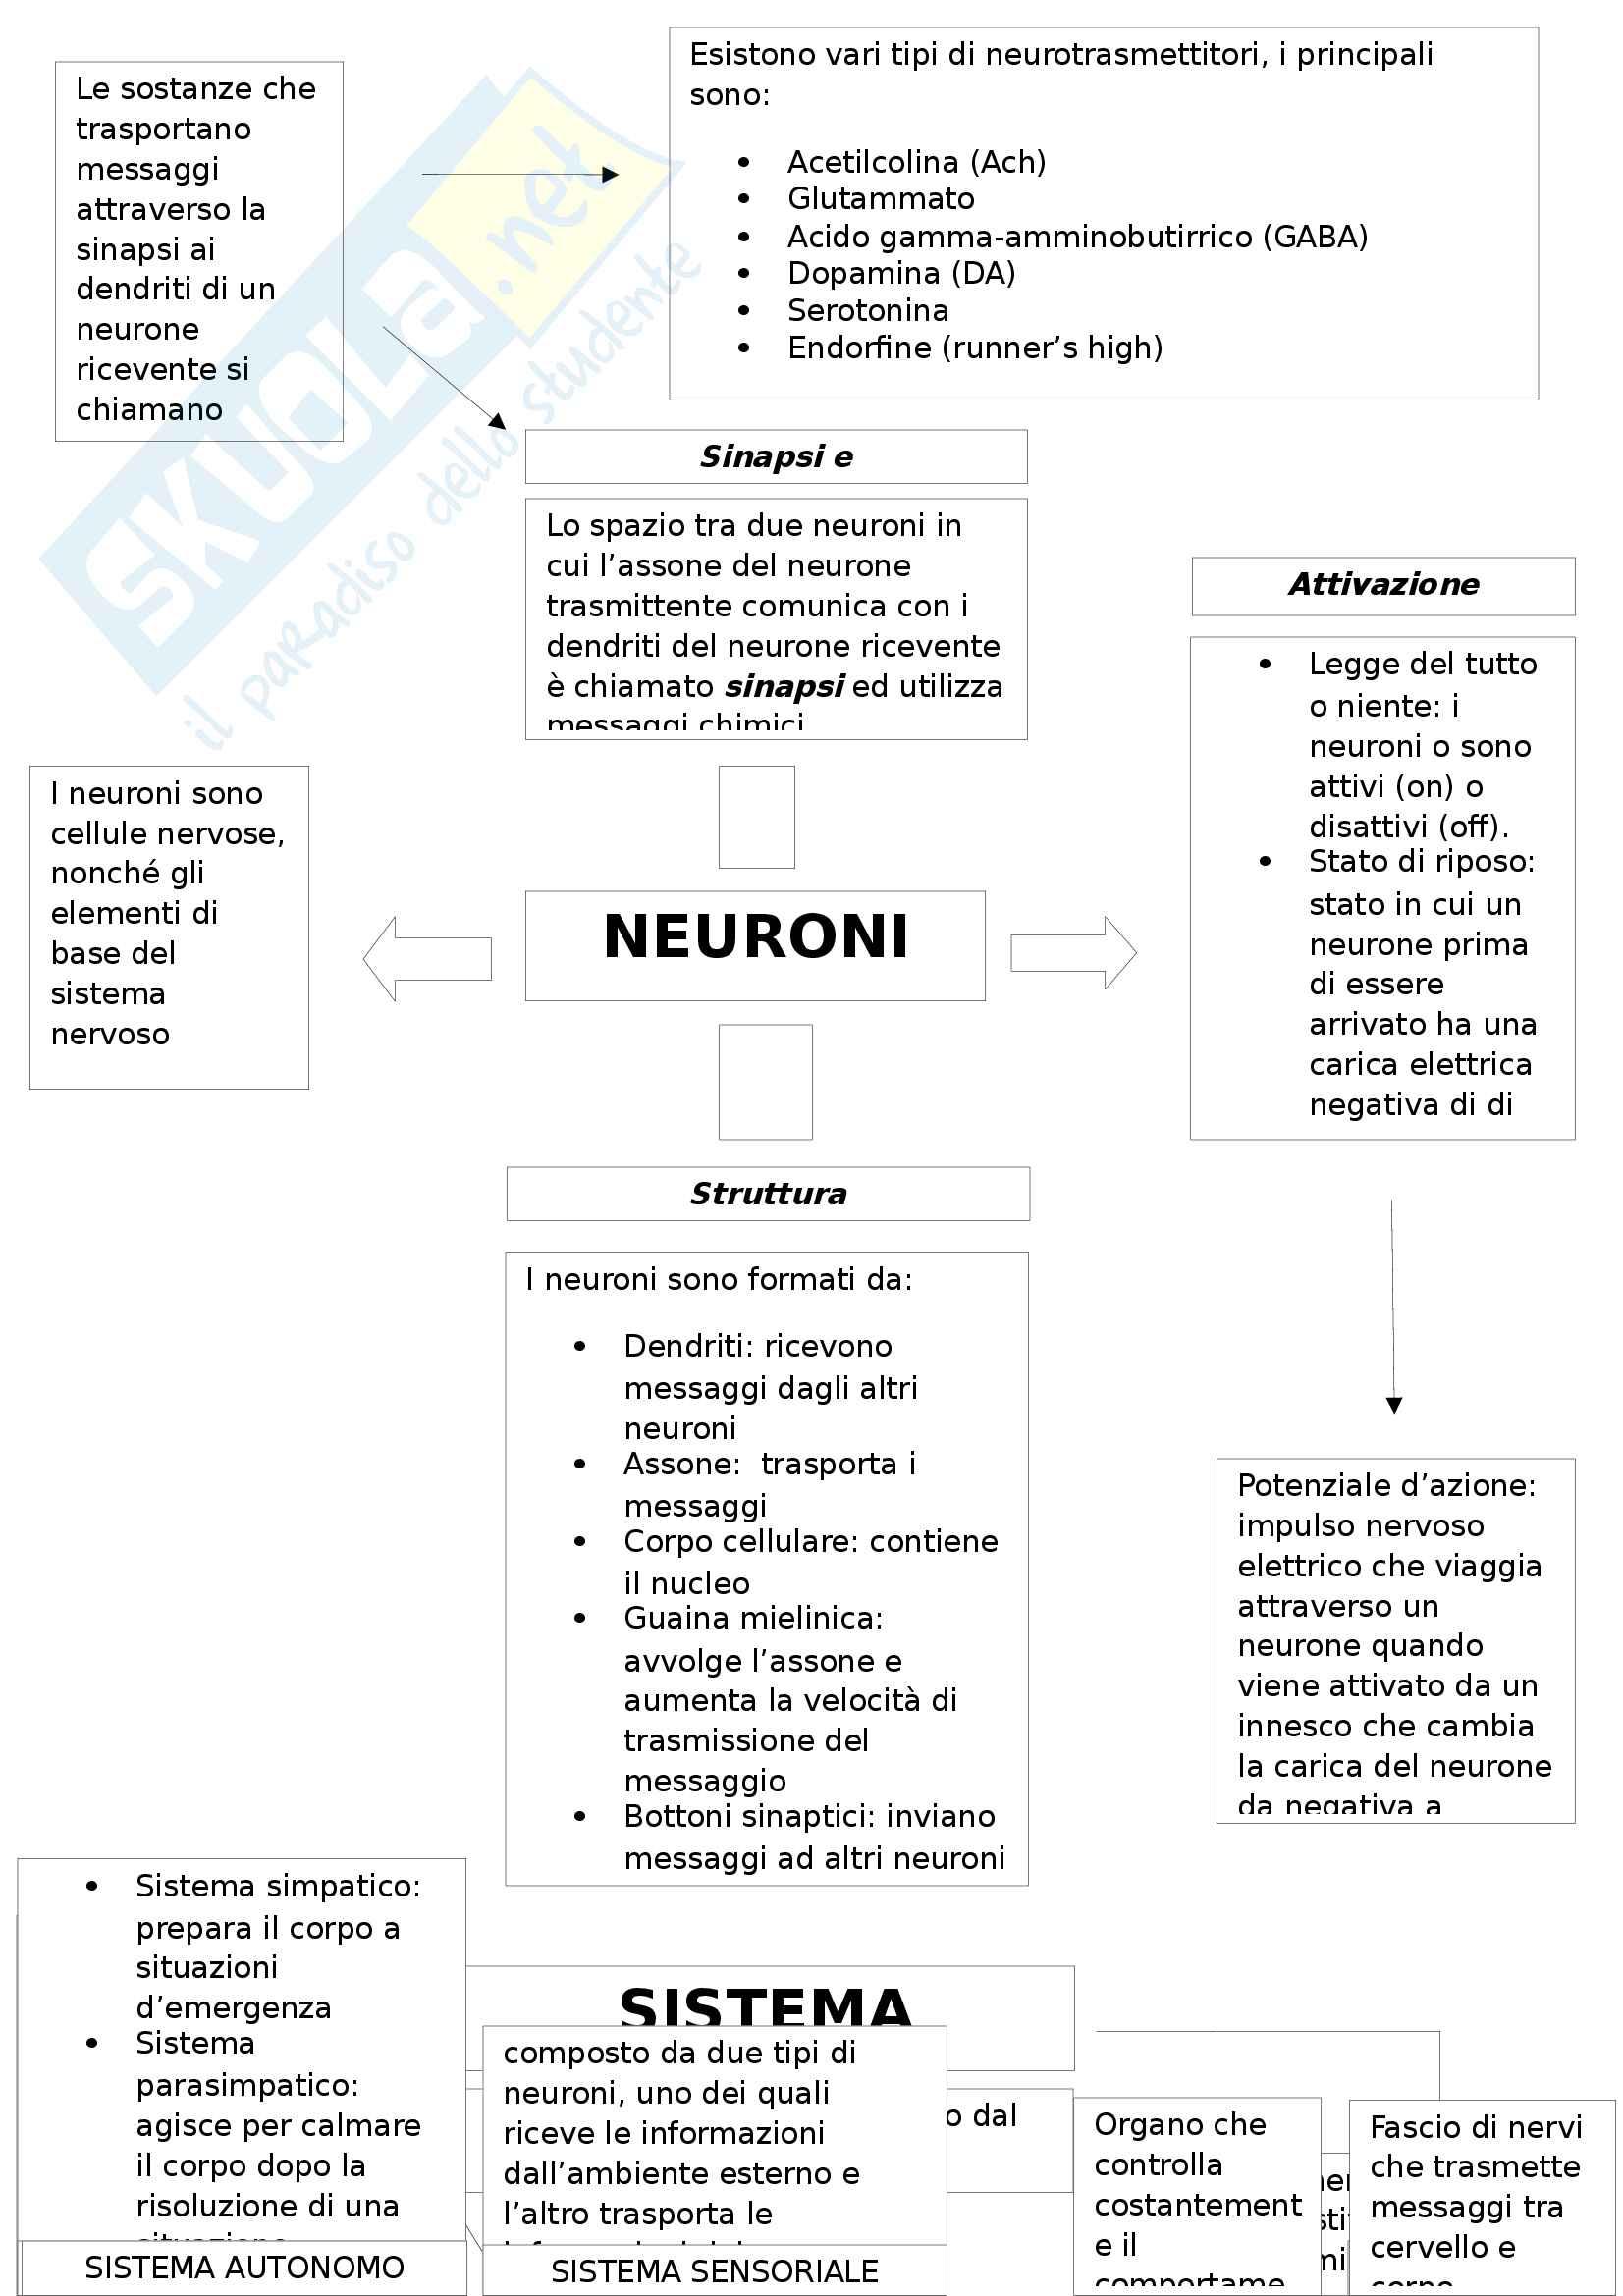 mappa sistema nervoso e cervello